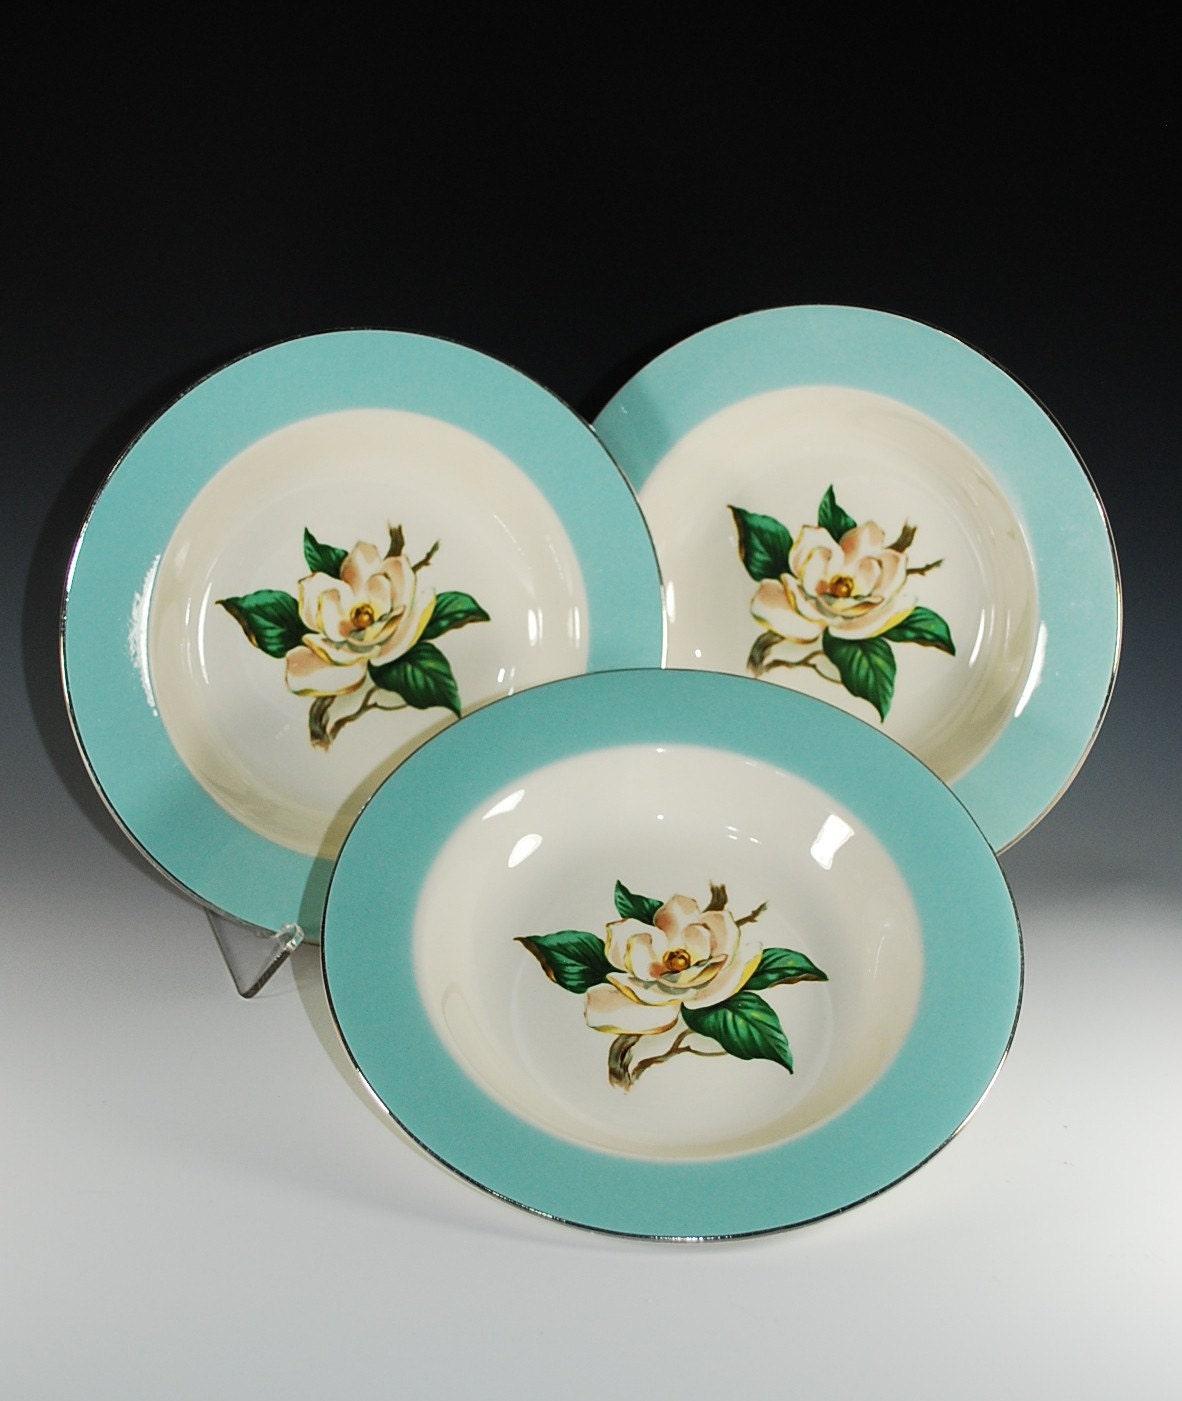 Homer Laughlin Dinnerware1957 In Turquoise Pattern Magnolia